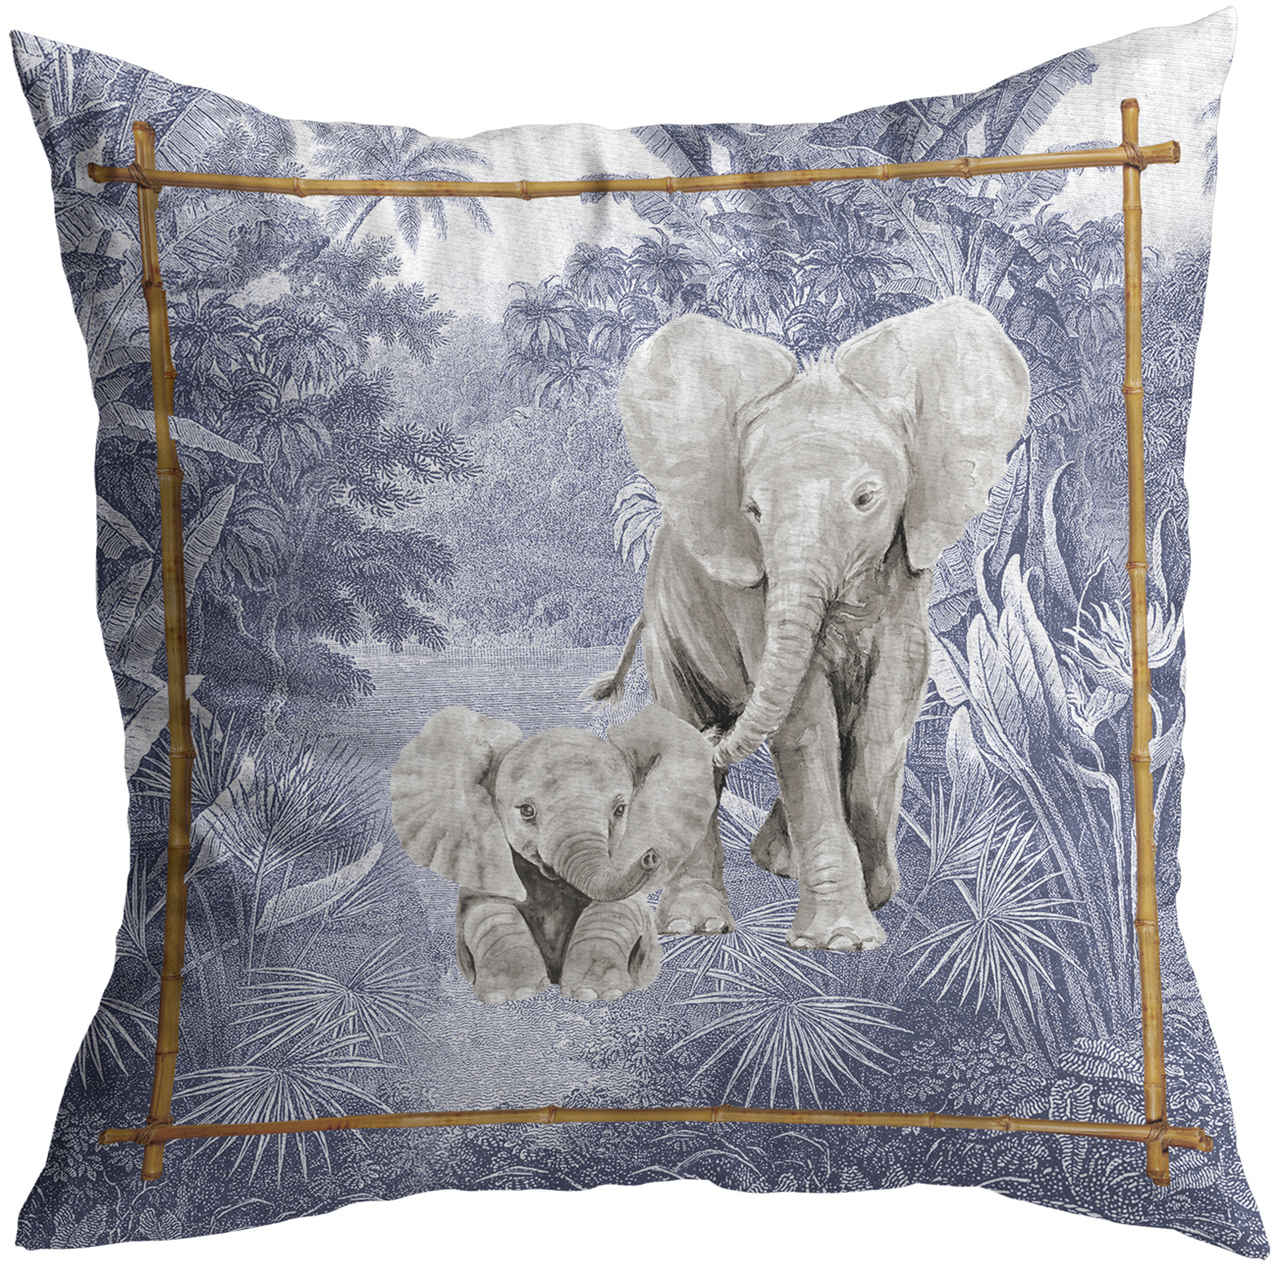 Almofada Elefante African Toile Cód.: 4134 - MB